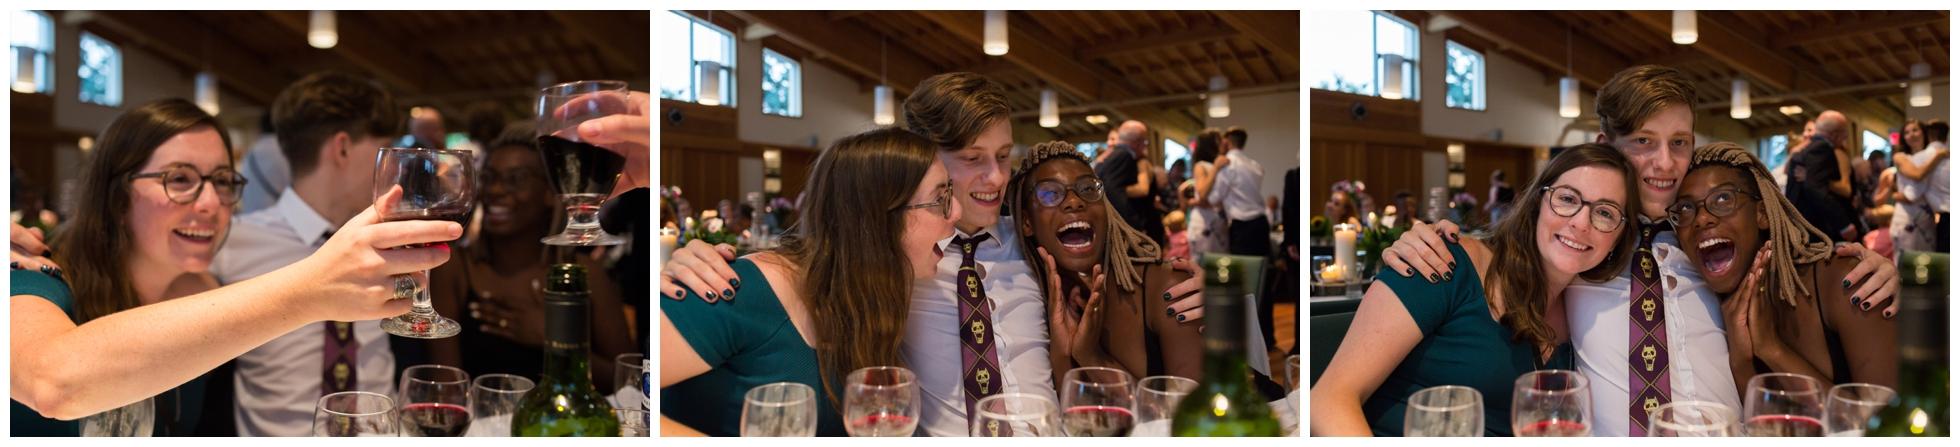 Toronto Wedding Chris Kate (Selena Phillips-Boyle)_0035.jpg